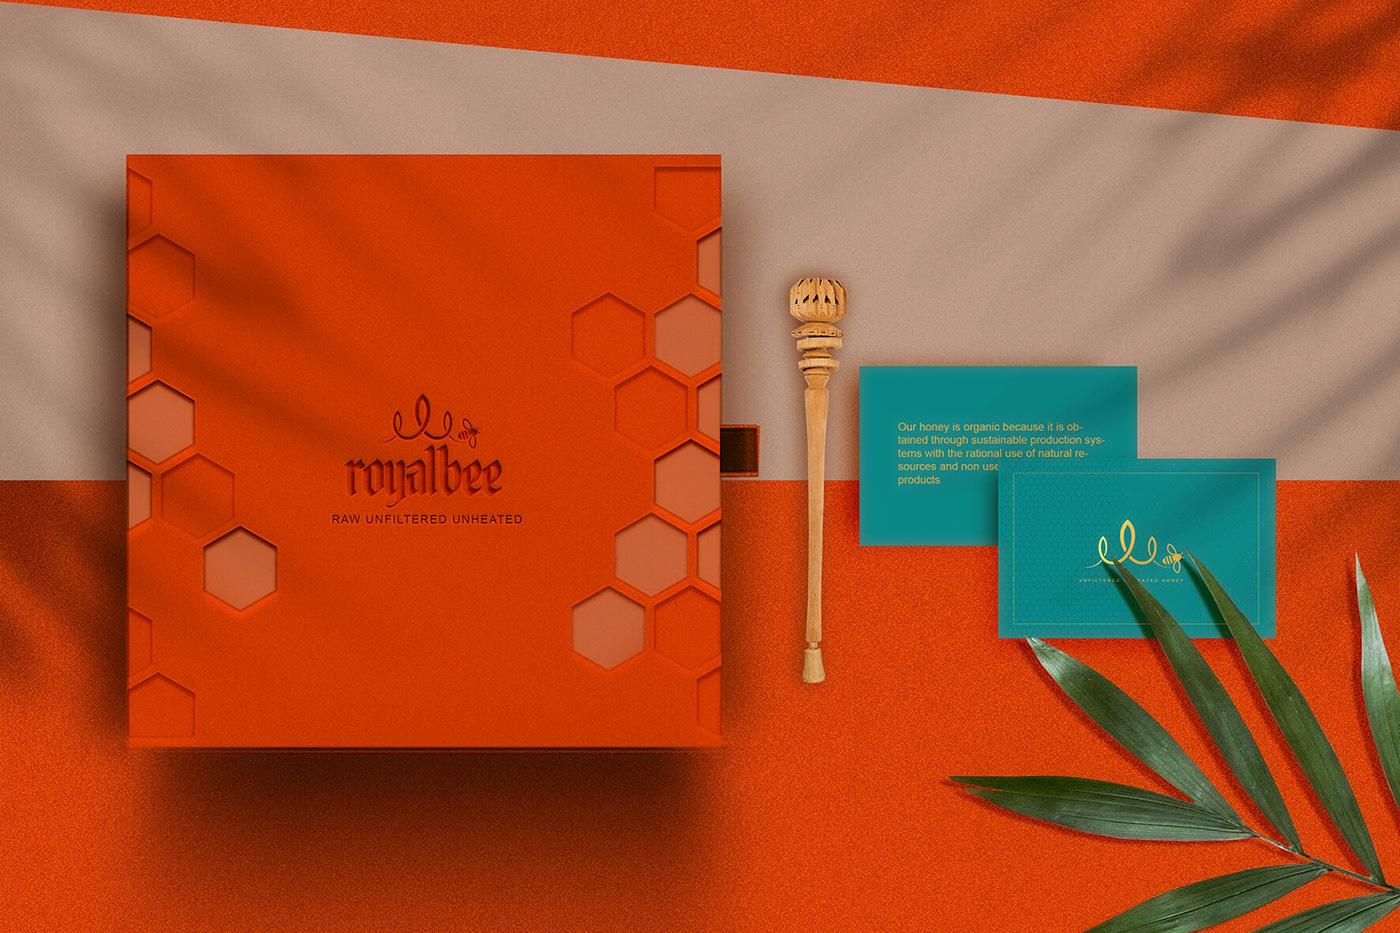 branding  Food  honey identity jar Label logo Mockup Packaging products